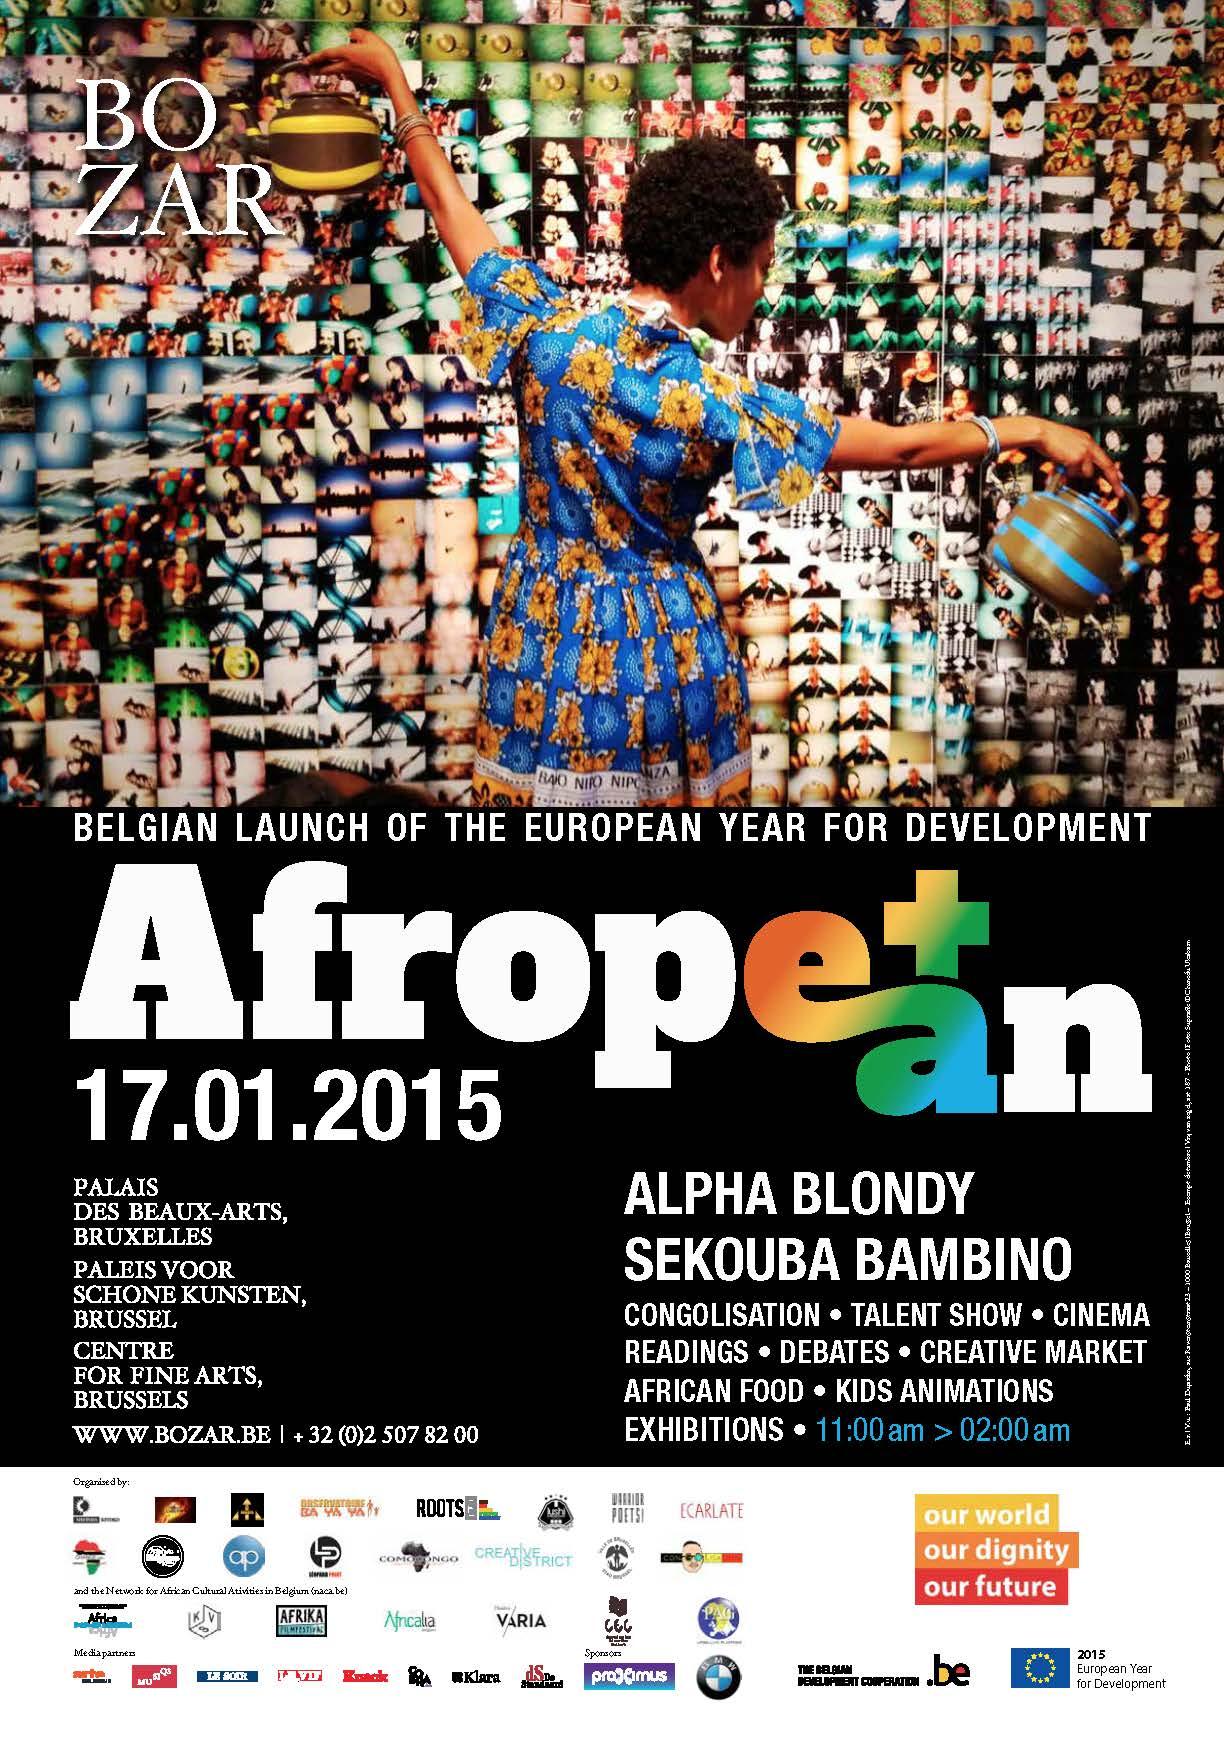 affiche afropean+_7.final